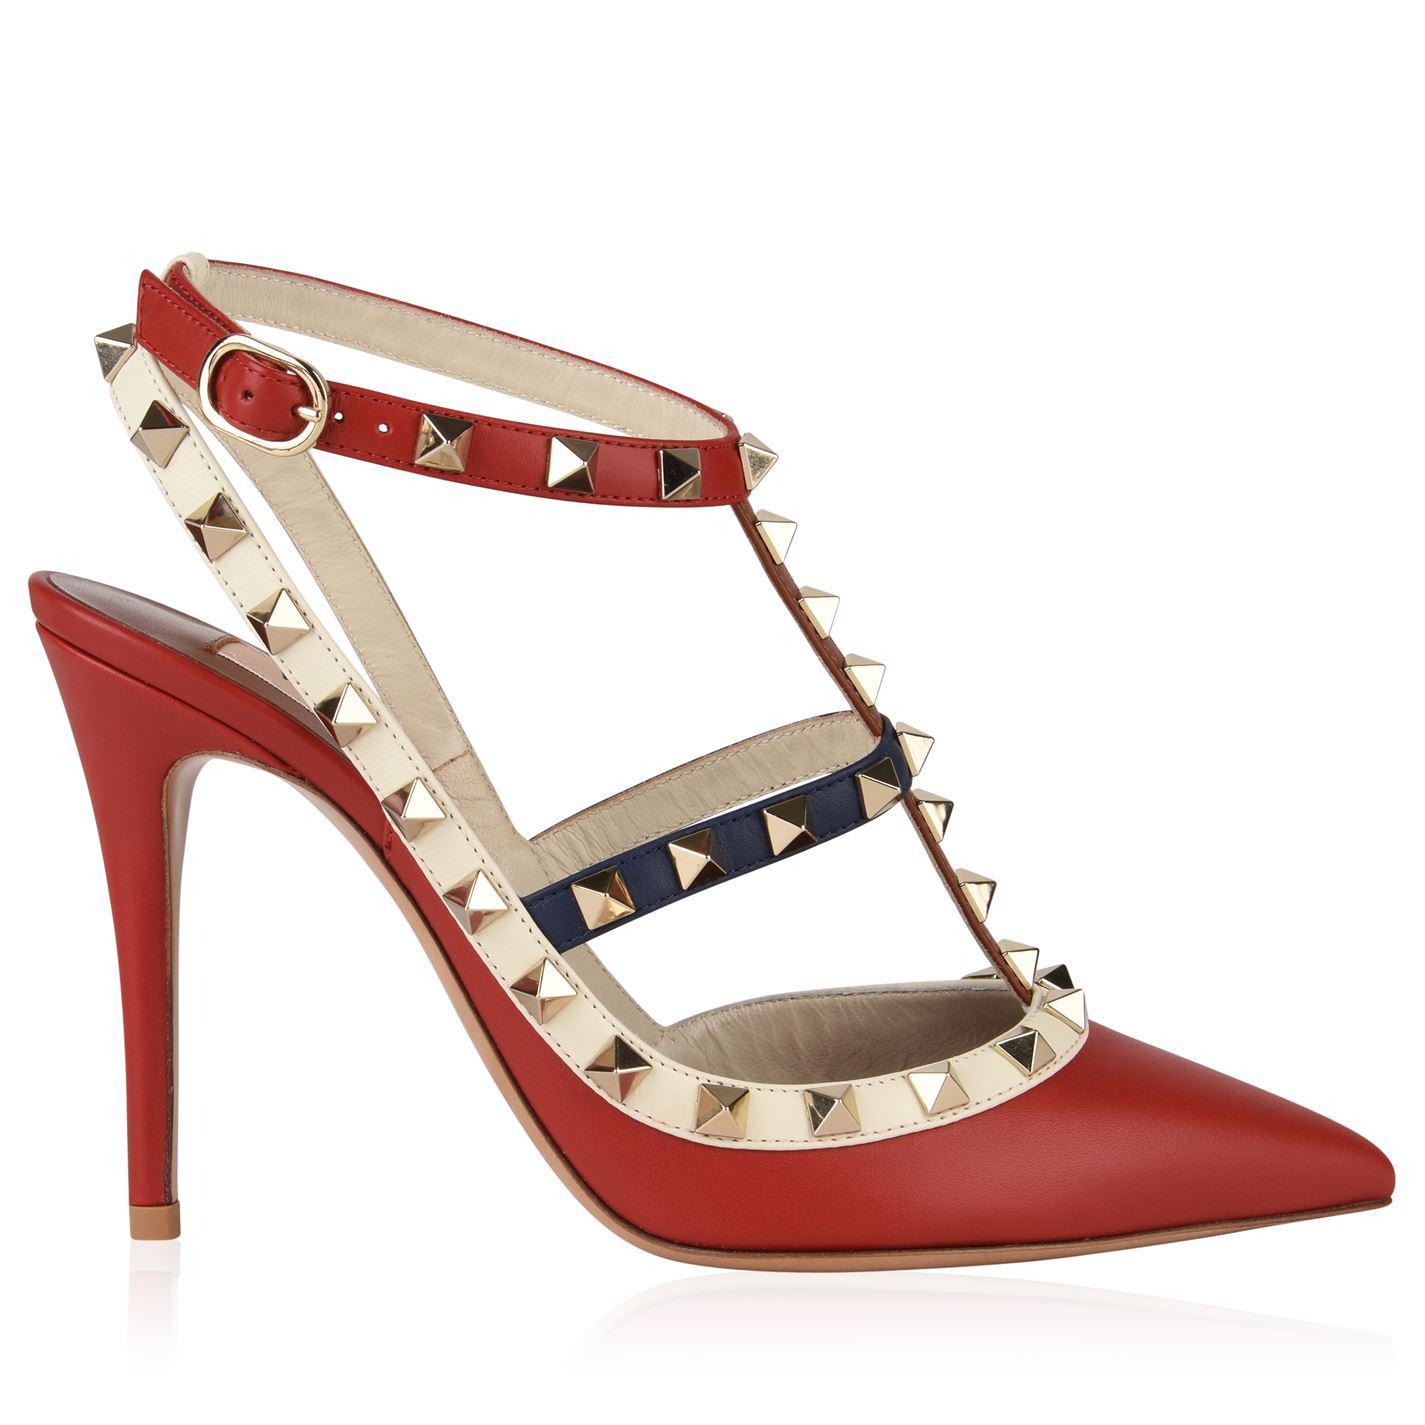 d12f3973e15 Valentino. Women s Rockstud 100 Ankle Strap Heels